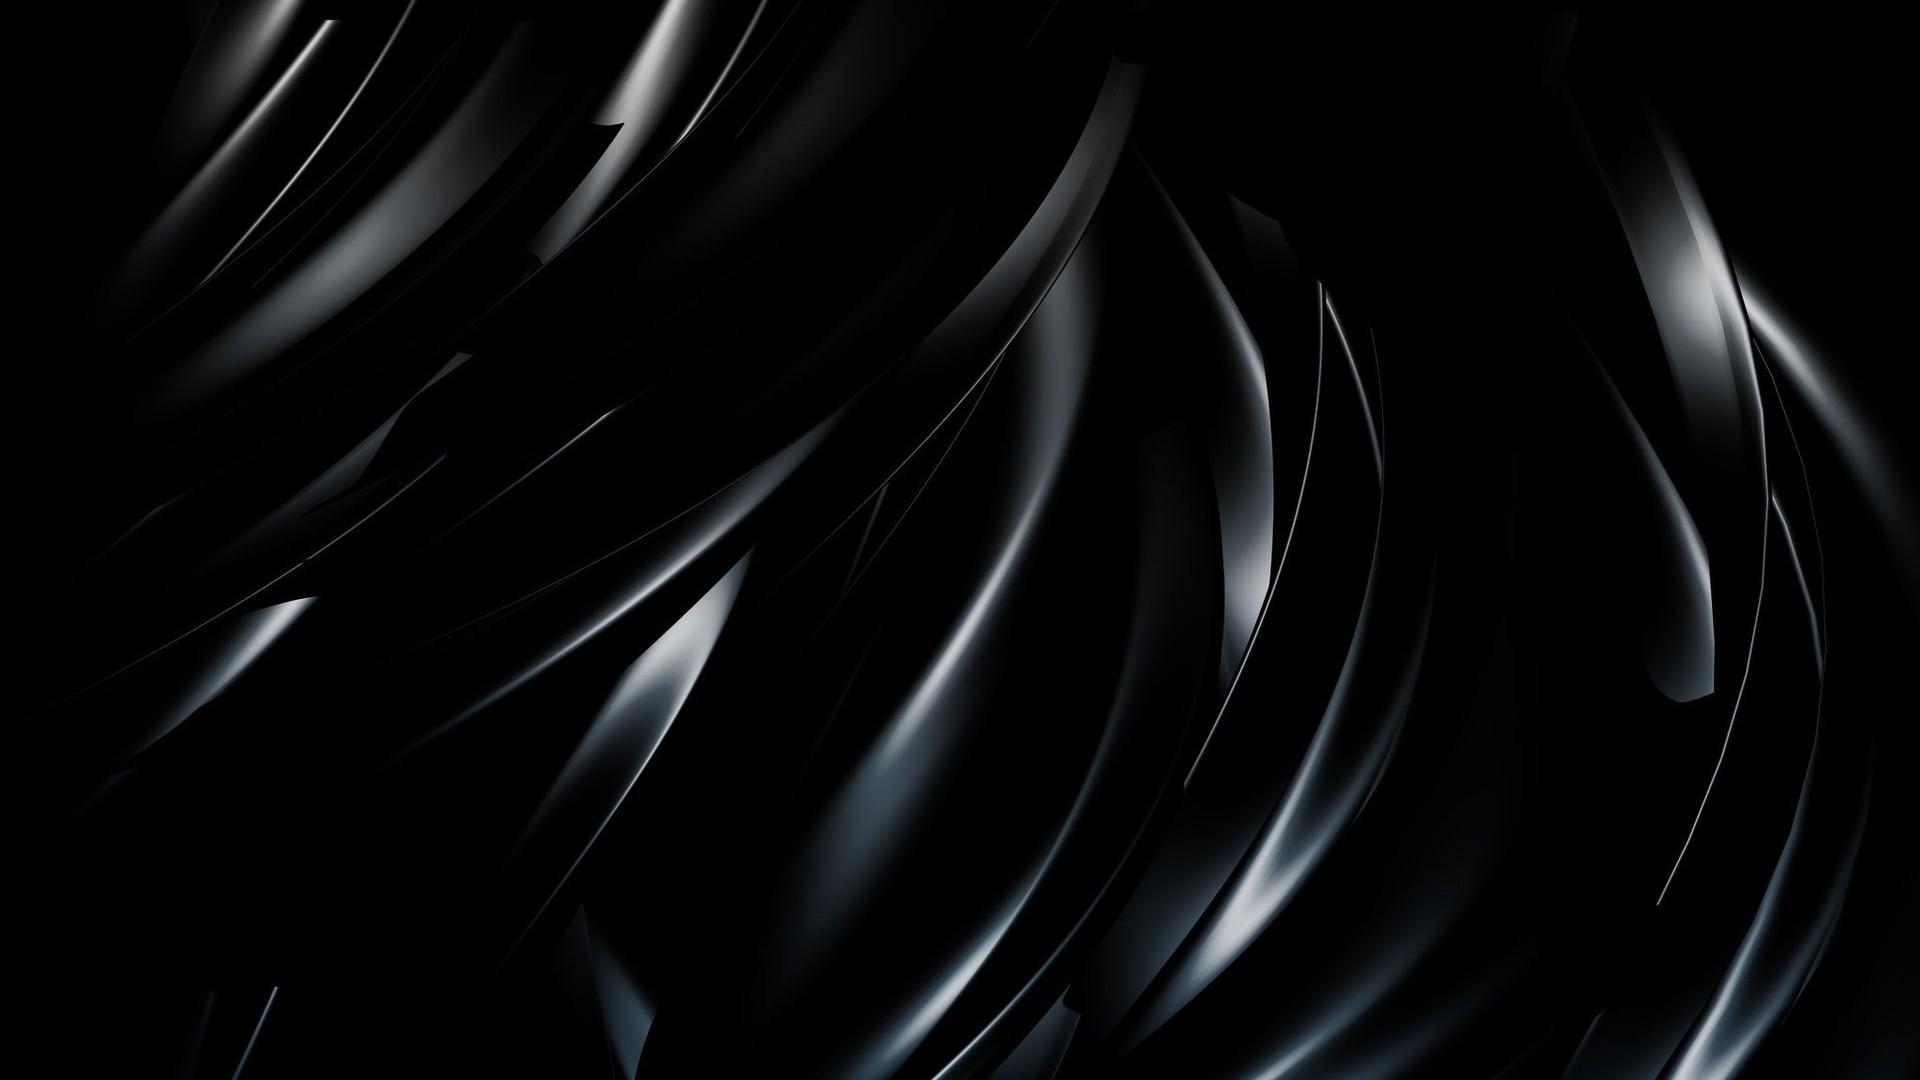 dark black abstract wallpaper - baltana